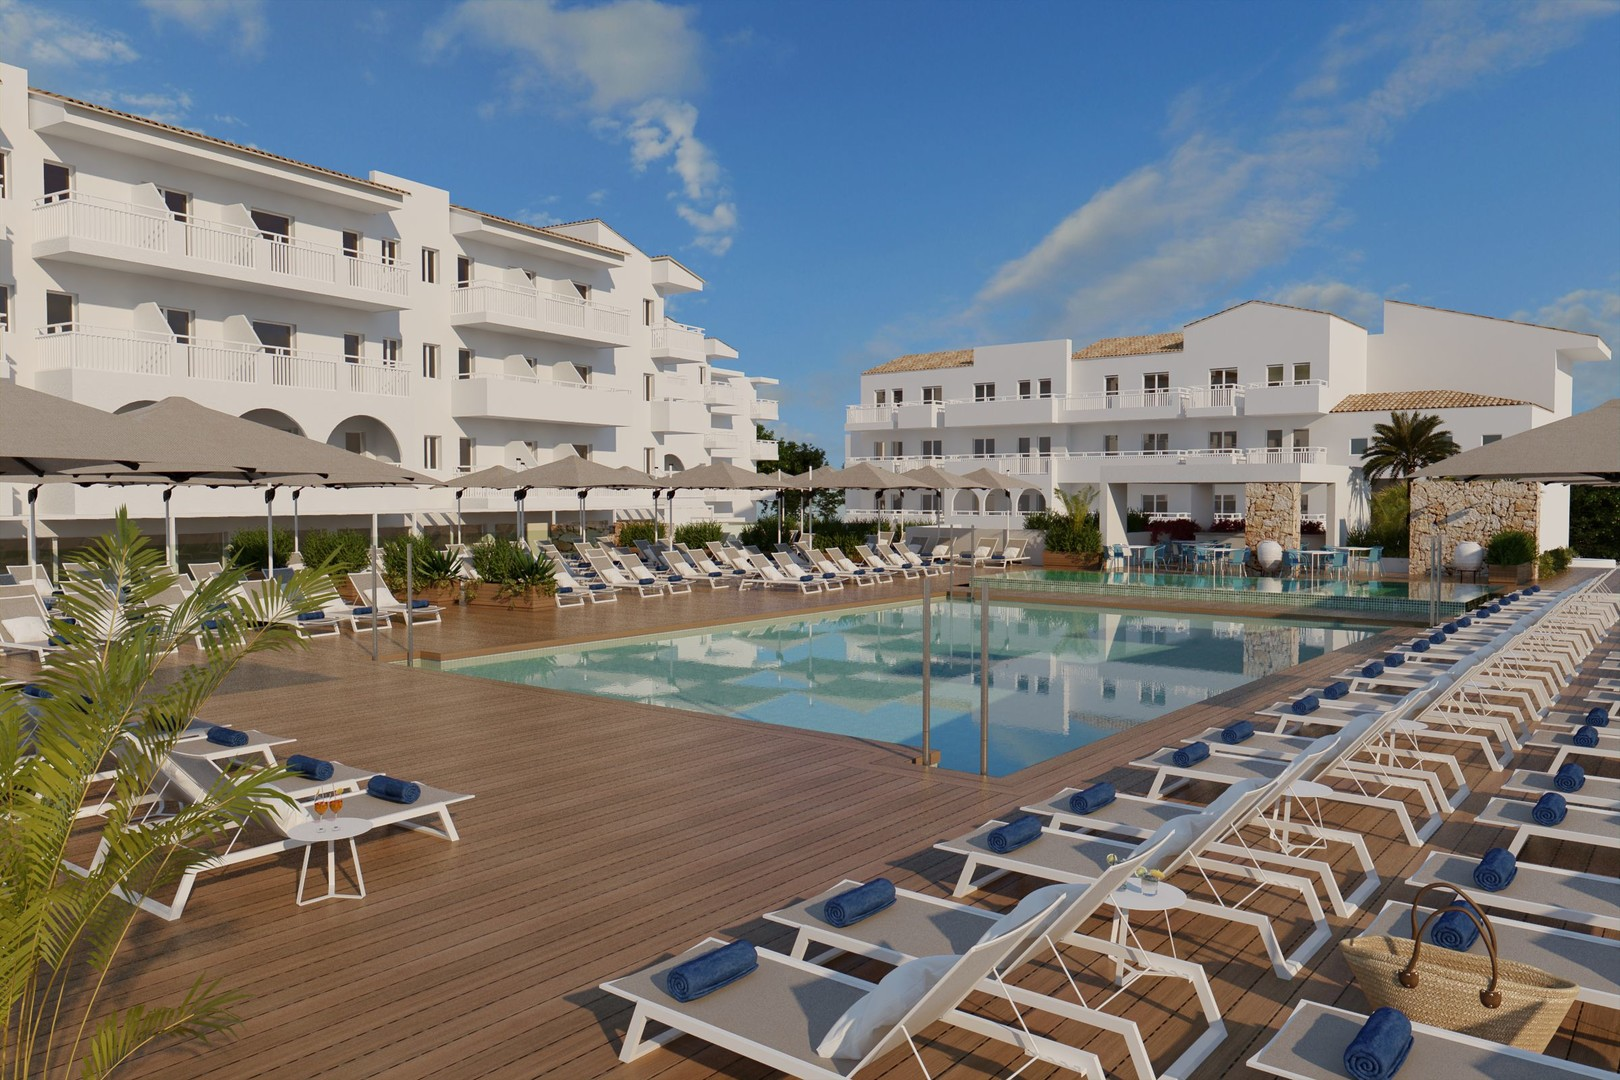 Hotel Barcelo Ponent Playa #2